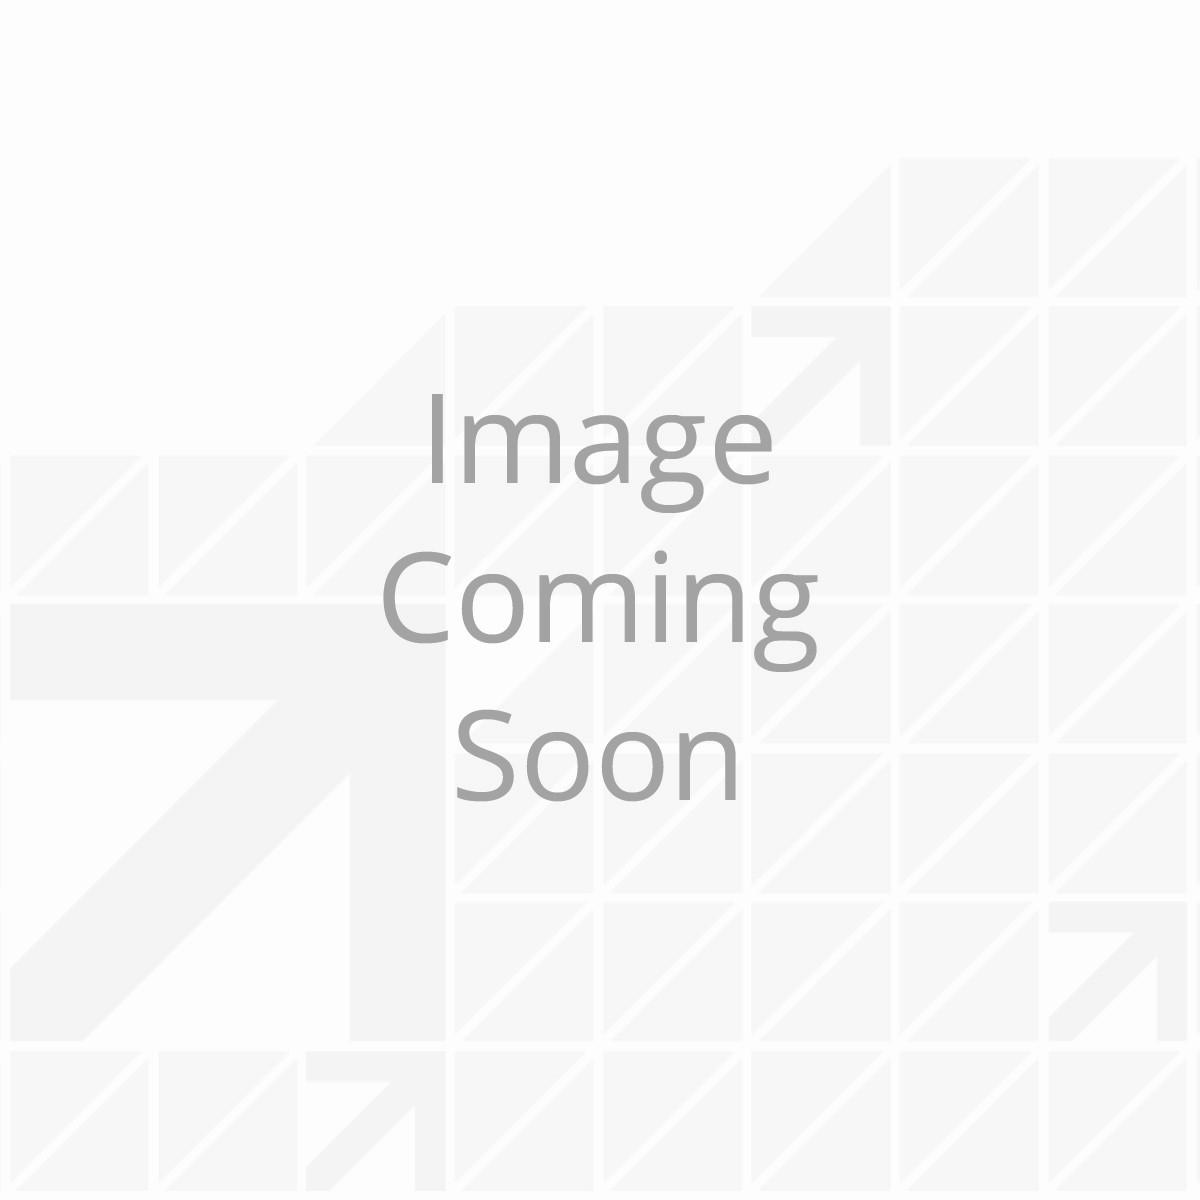 14' Power & Hybrid Awning Roller Assembly - Prepflex Blue Fade